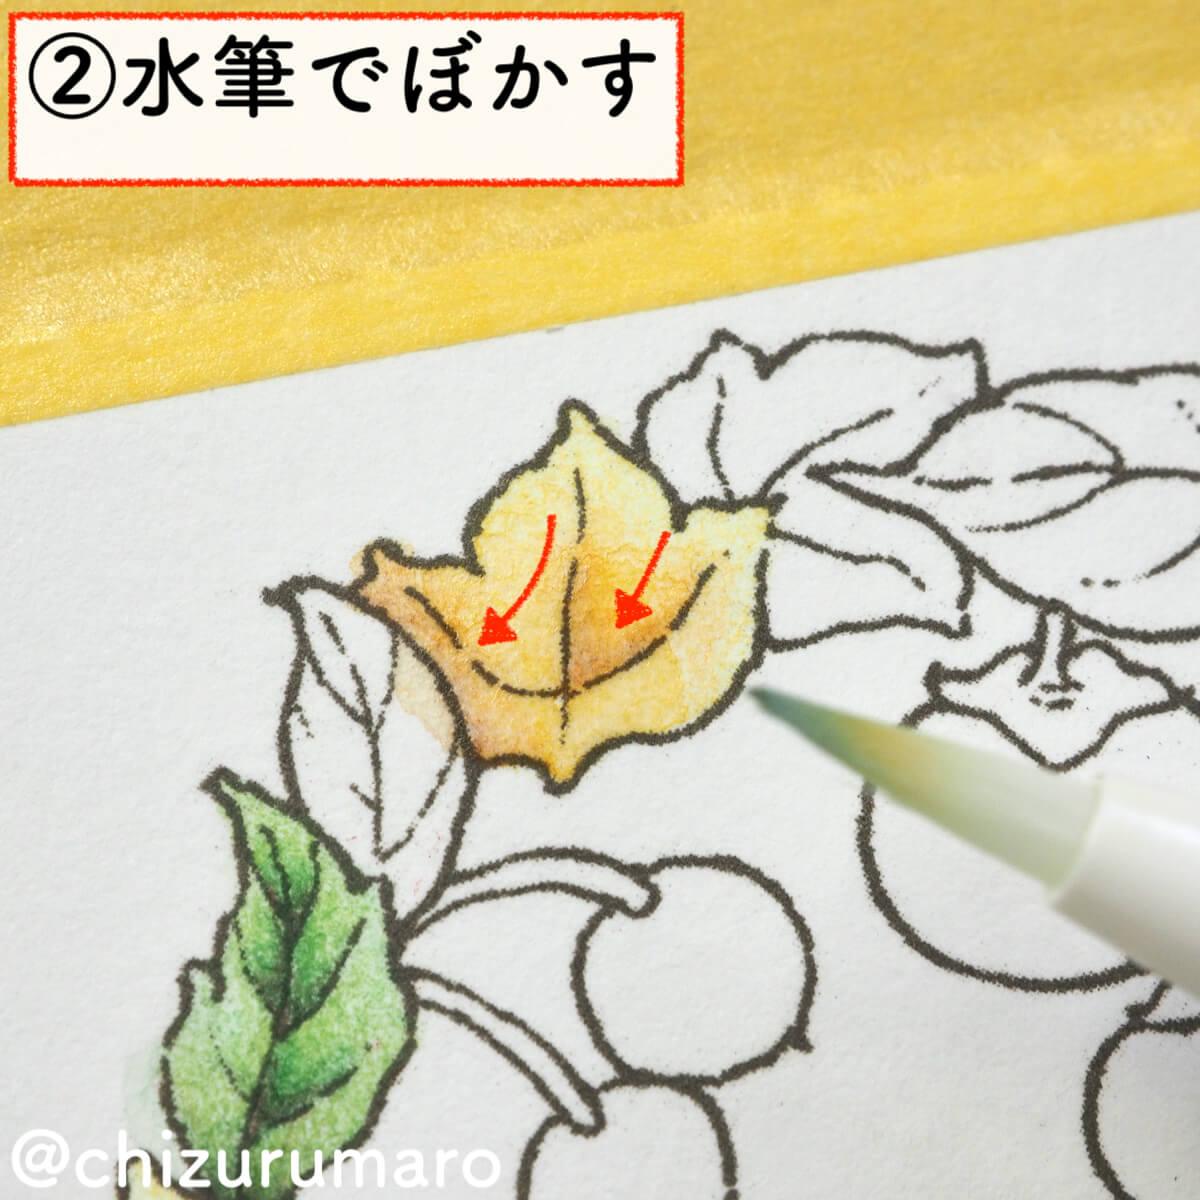 f:id:chizurumaro:20200217143226j:plain